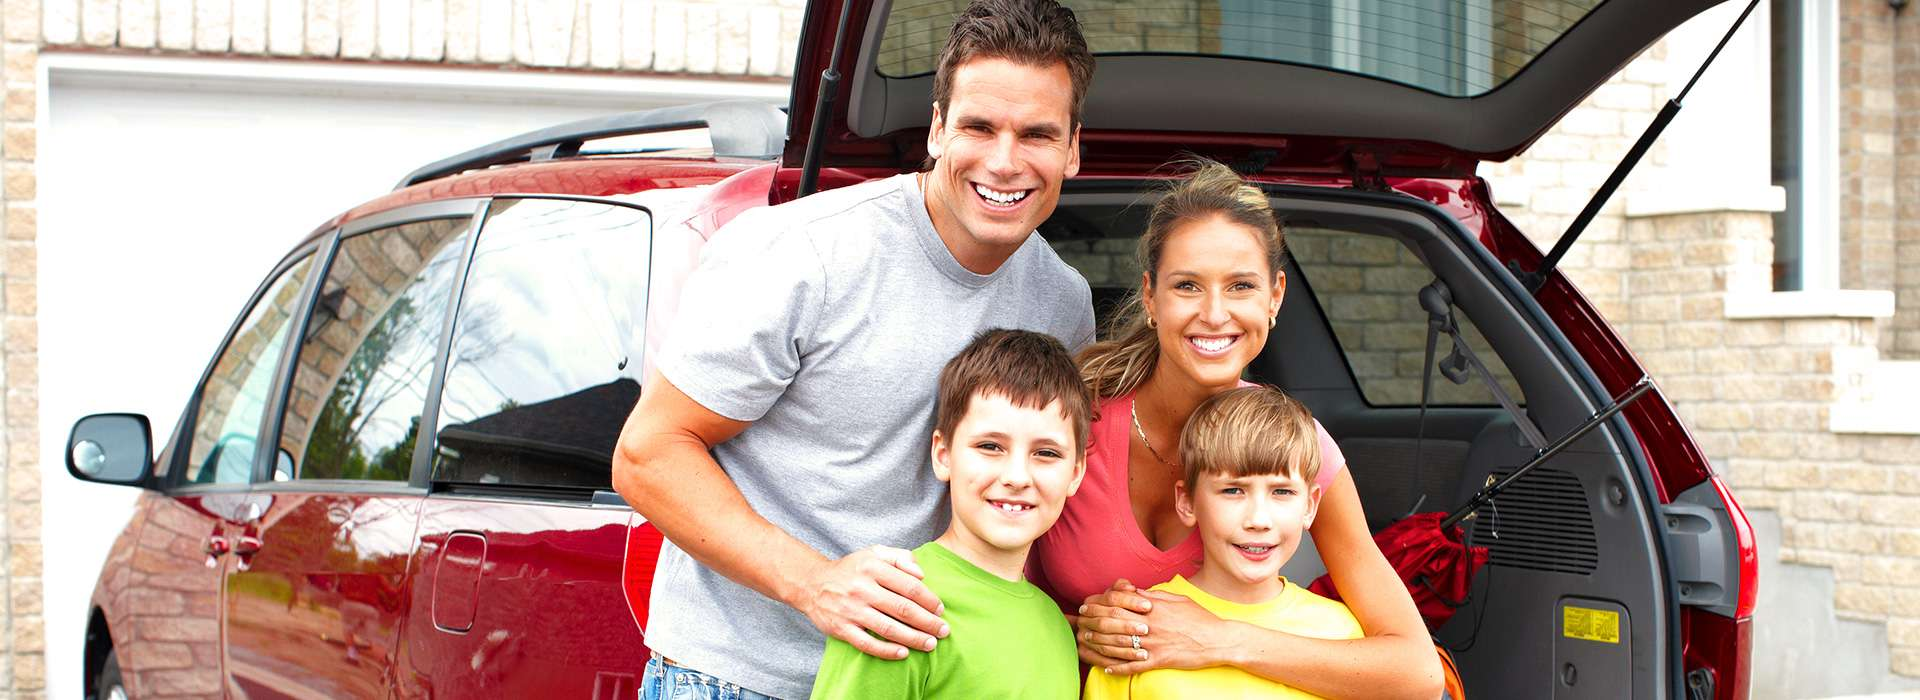 John Galt Auto/Car Insurance